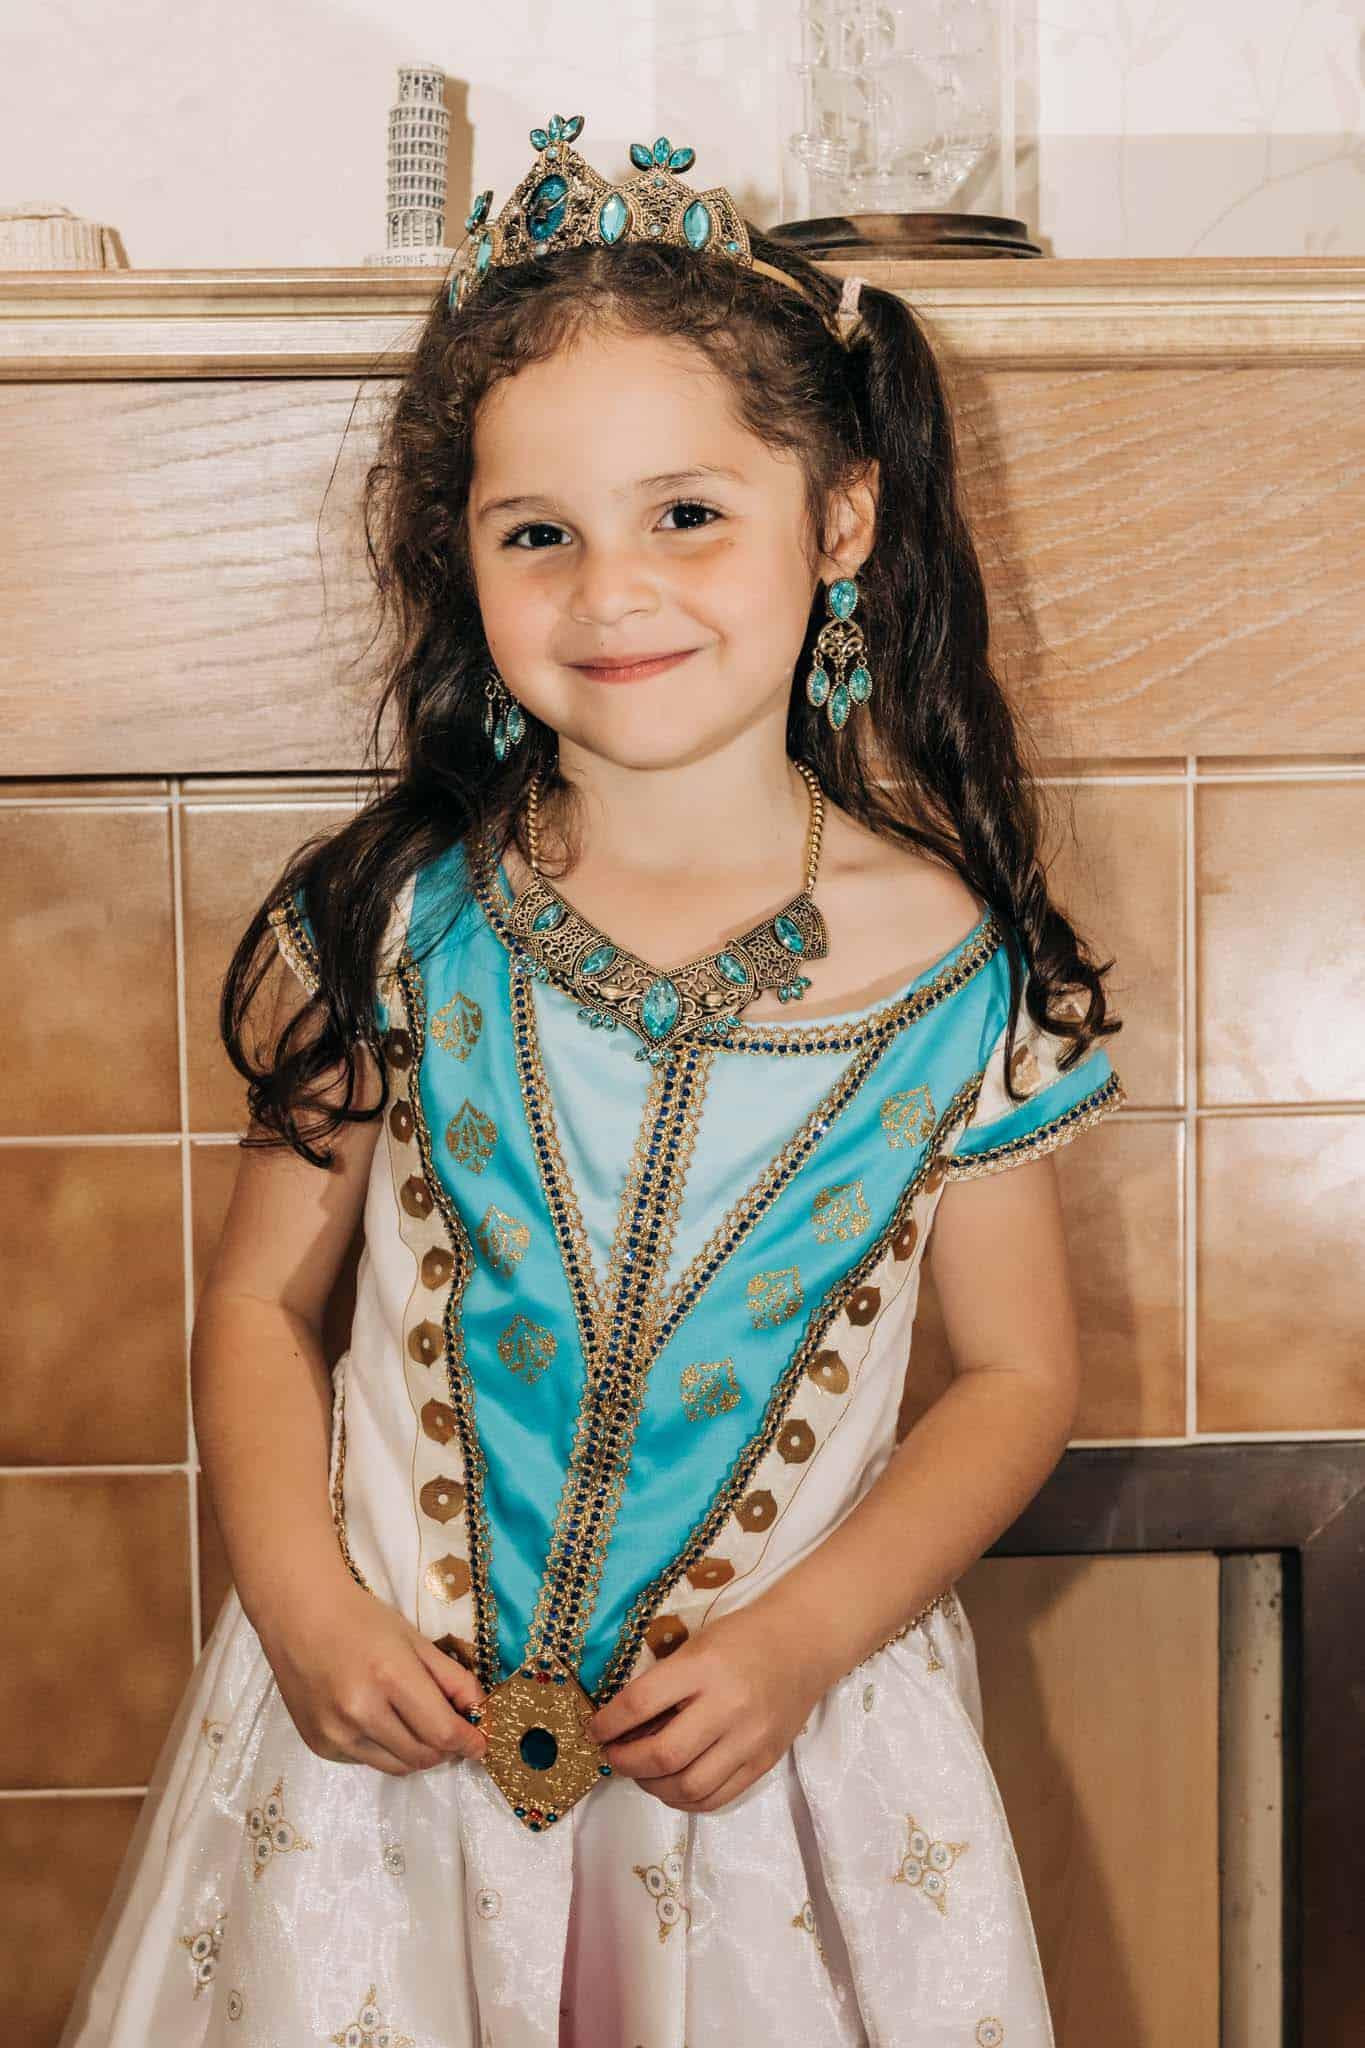 Disney Princess Jasmine Costume And Accessories The Inspiration Edit